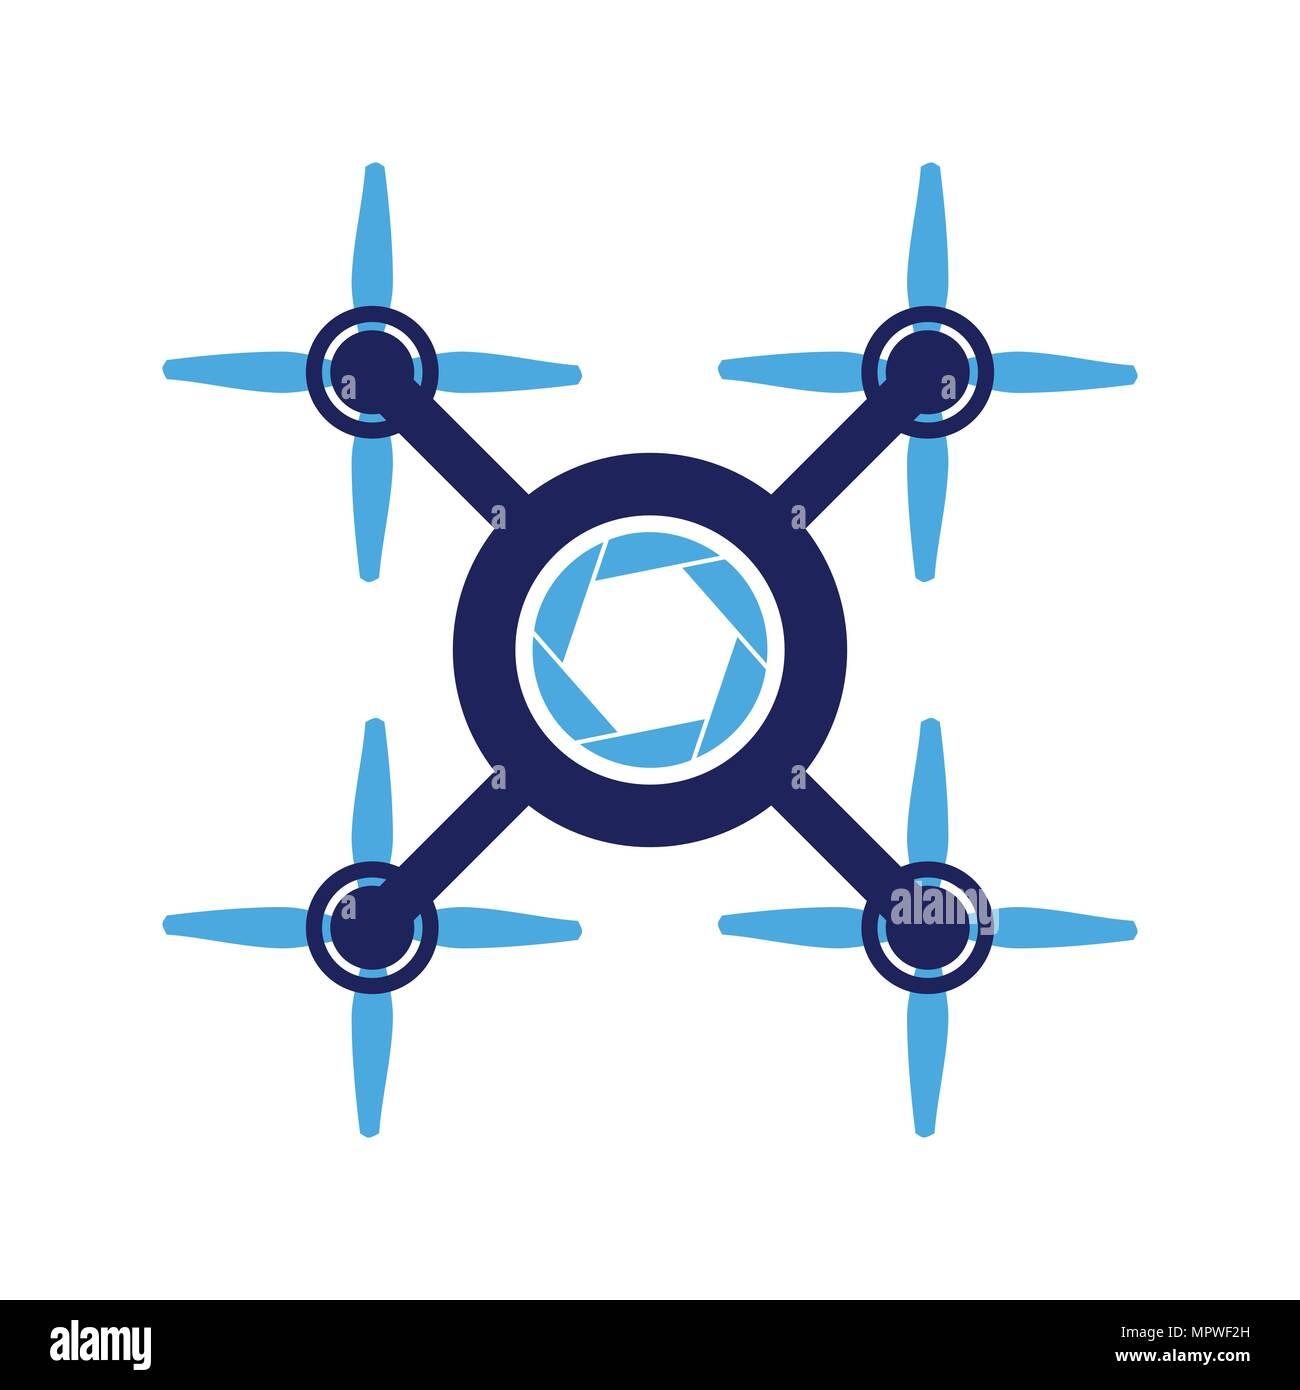 Four Propeller Aero Drone Photography Vector Symbol Graphic Logo Design - Stock Image